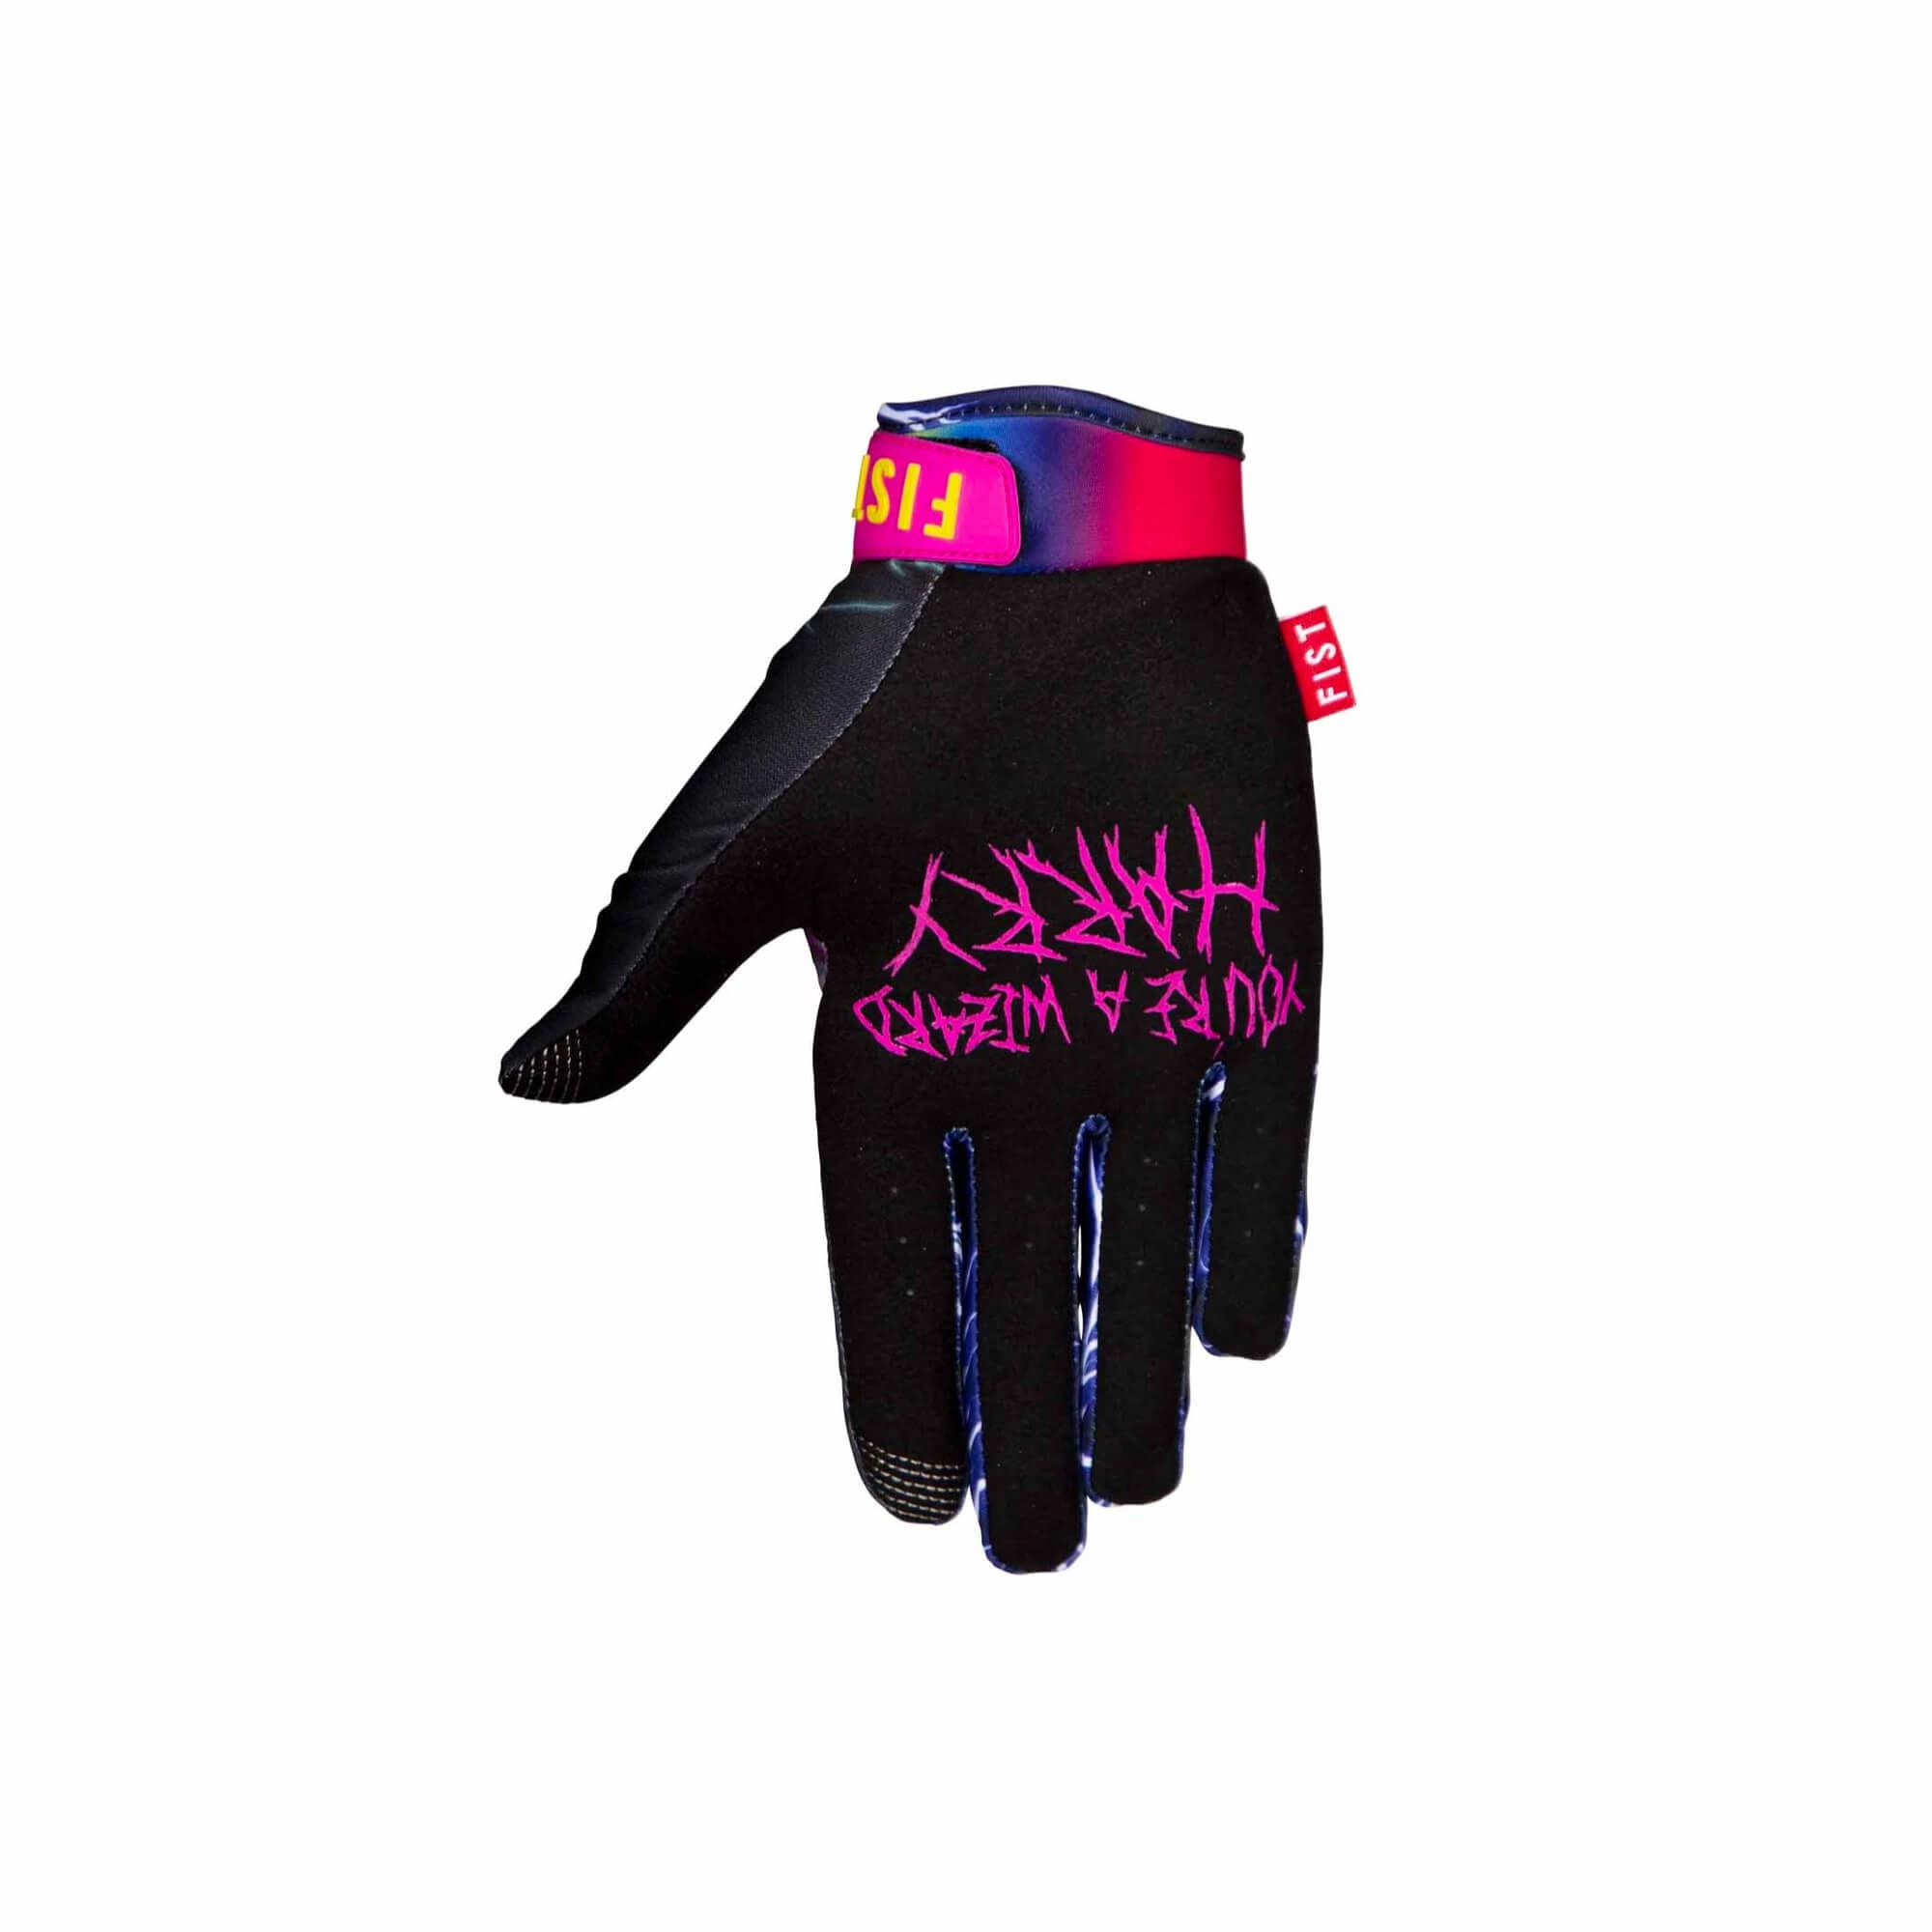 Harry Bink Gloves - Youre a Wizard 2-2